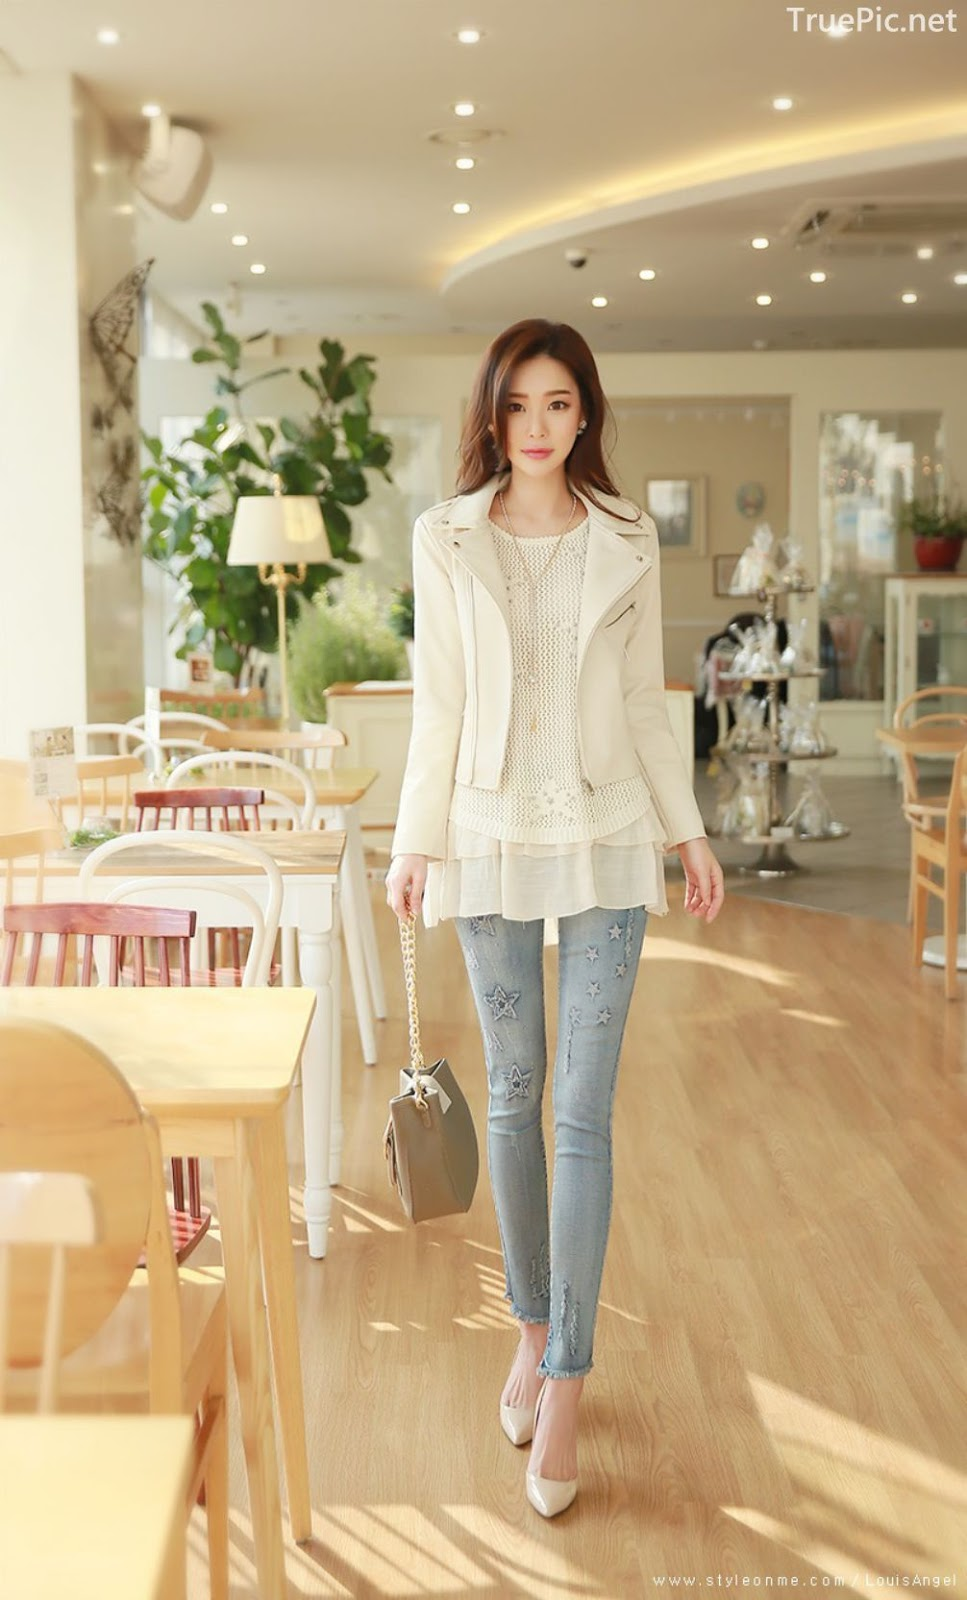 Korean Fashion Model - Park Da Hyun - Indoor Photoshoot Collection - TruePic.net - Picture 10